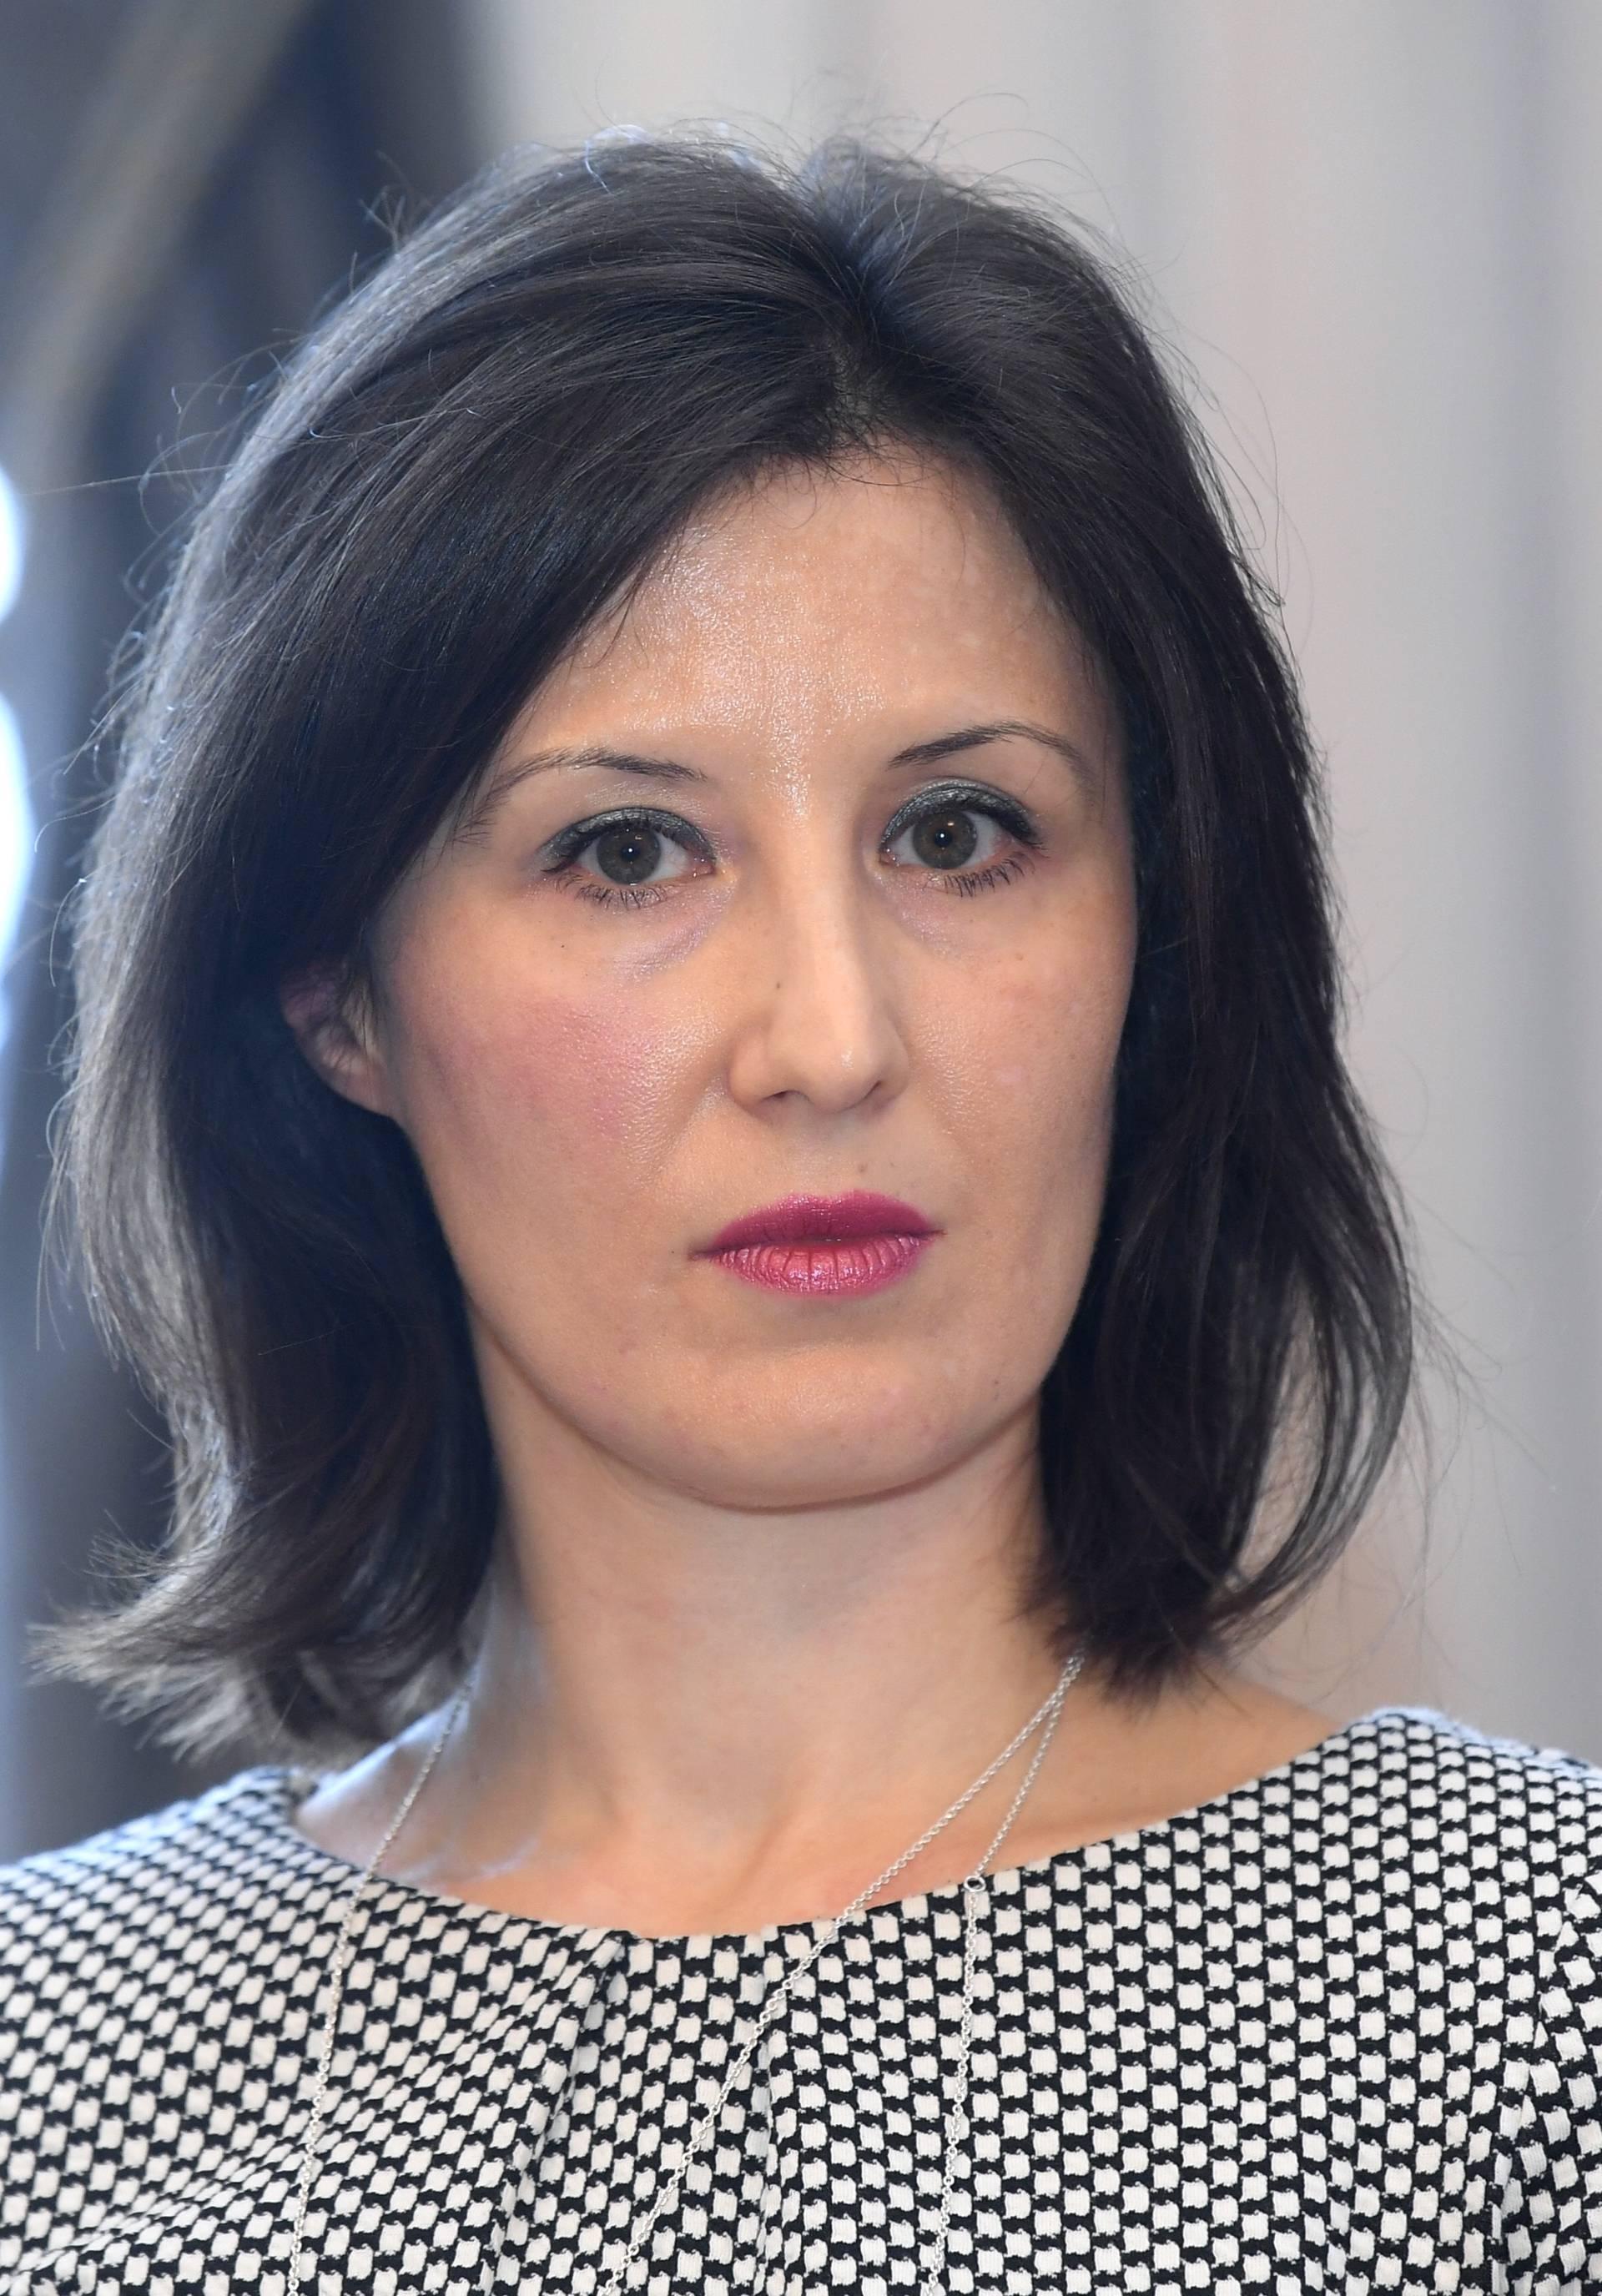 Zagreb: Konferencija Hrvatska bez korupcije u organizaciji stranke Pametno